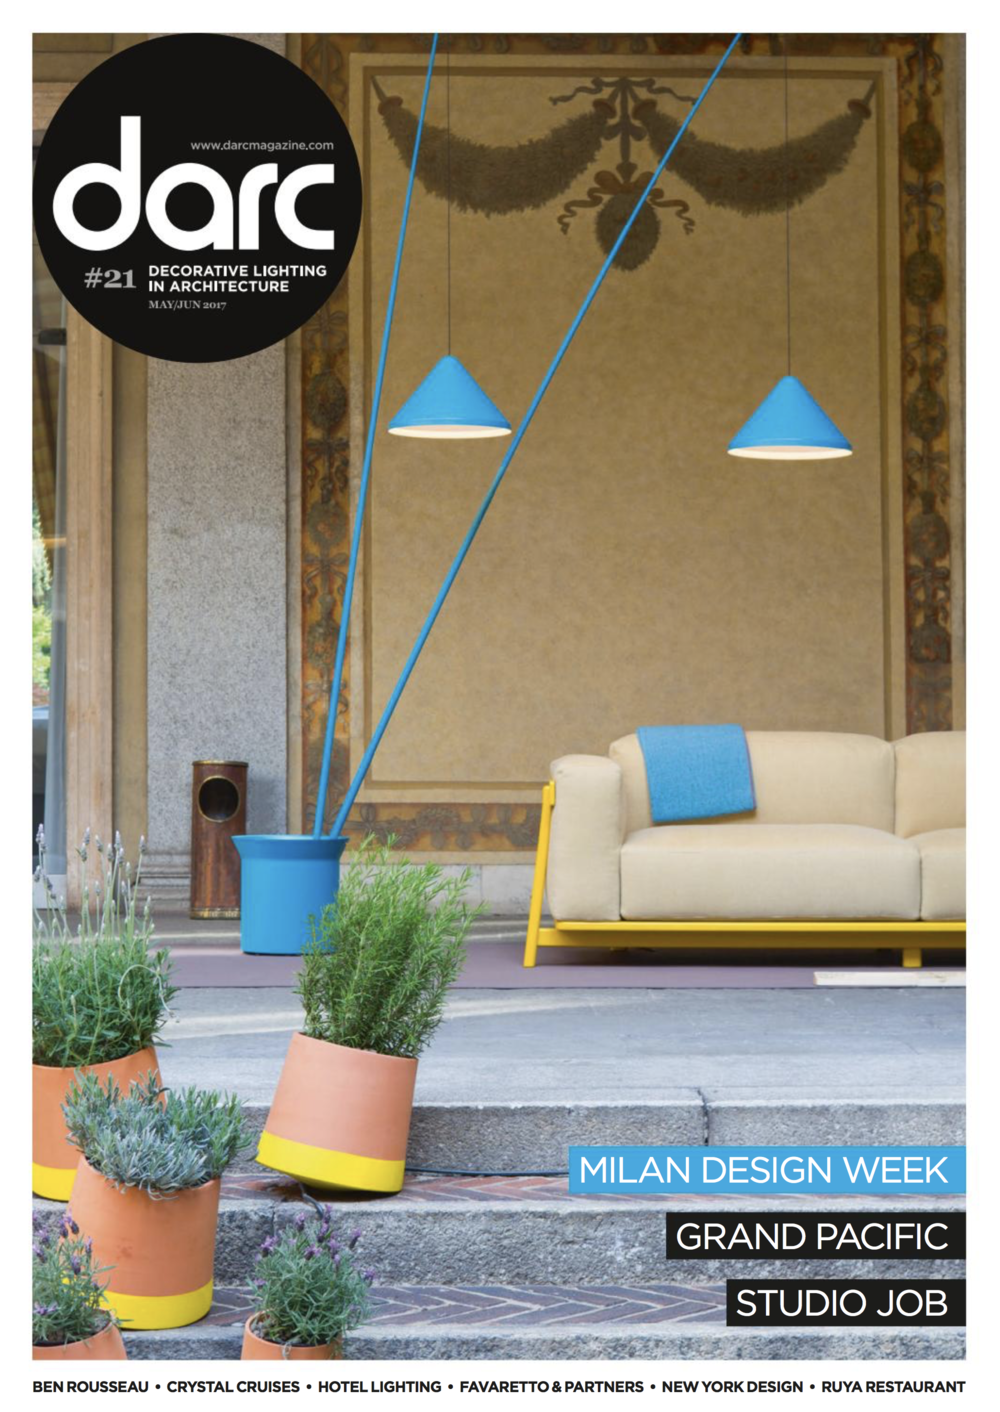 Darc Magazine May/June 2017